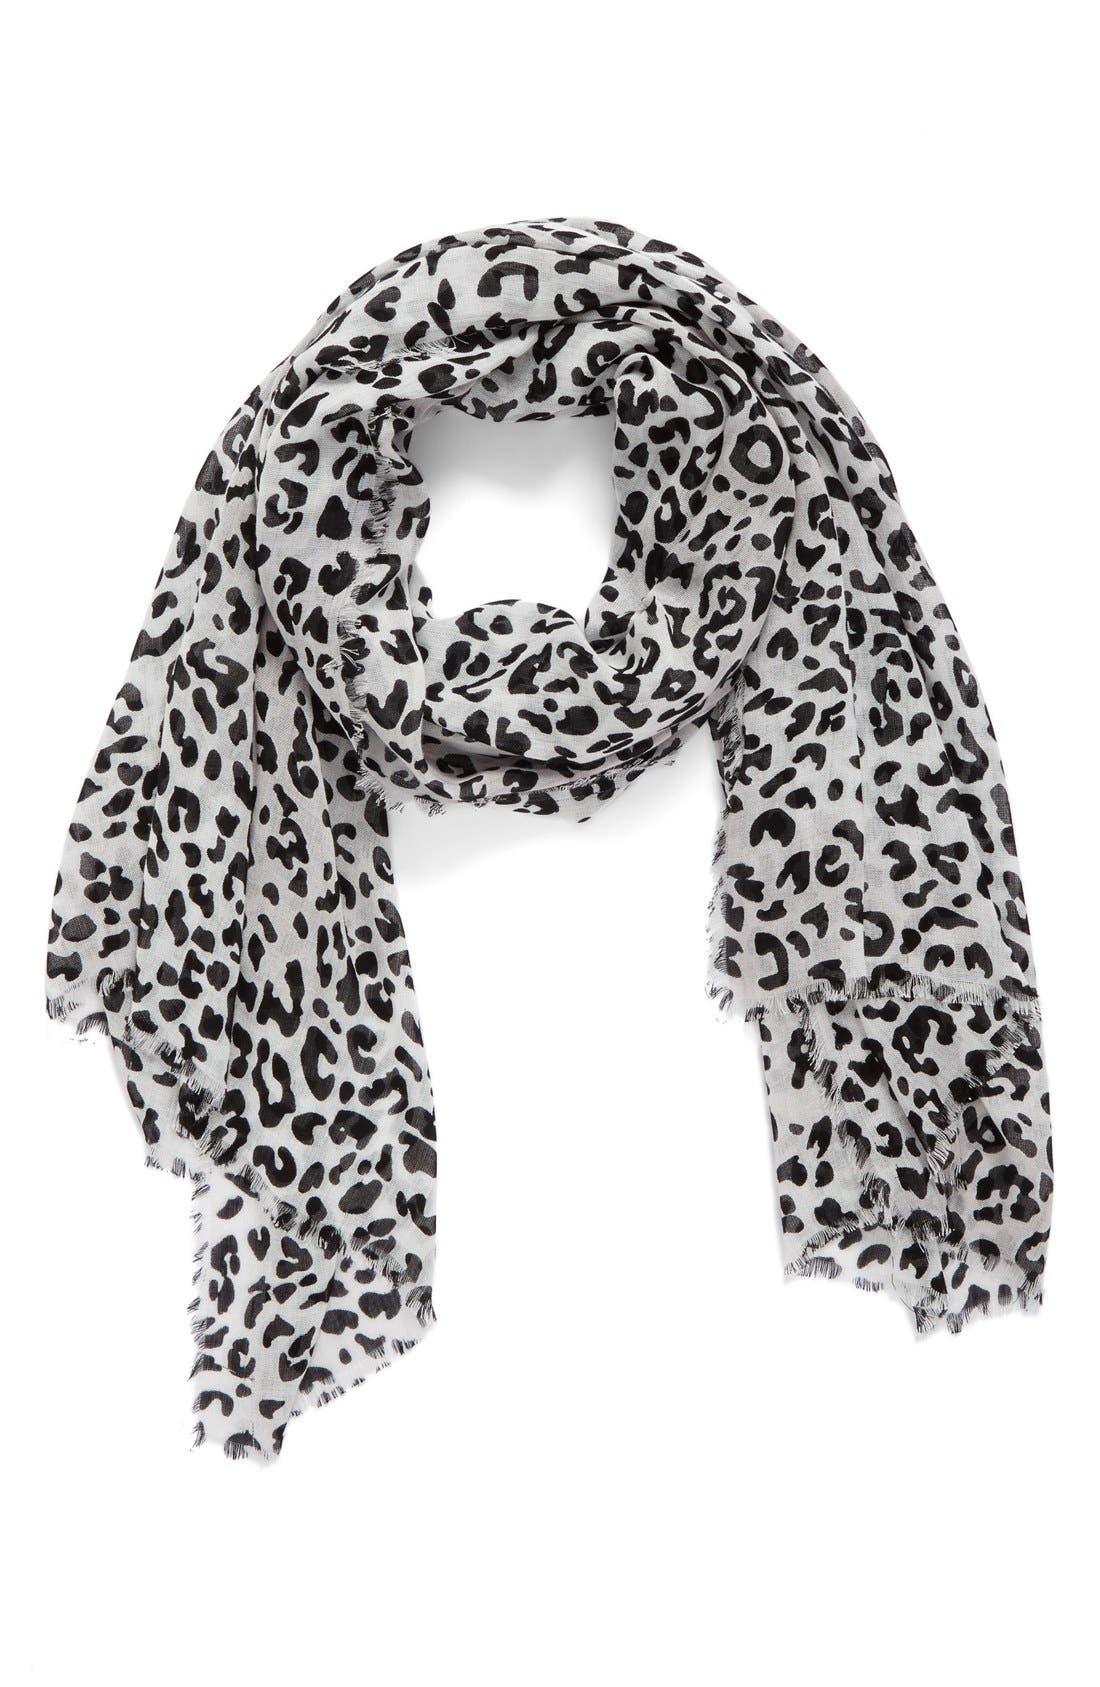 Alternate Image 1 Selected - Nordstrom Leopard Print Wrap